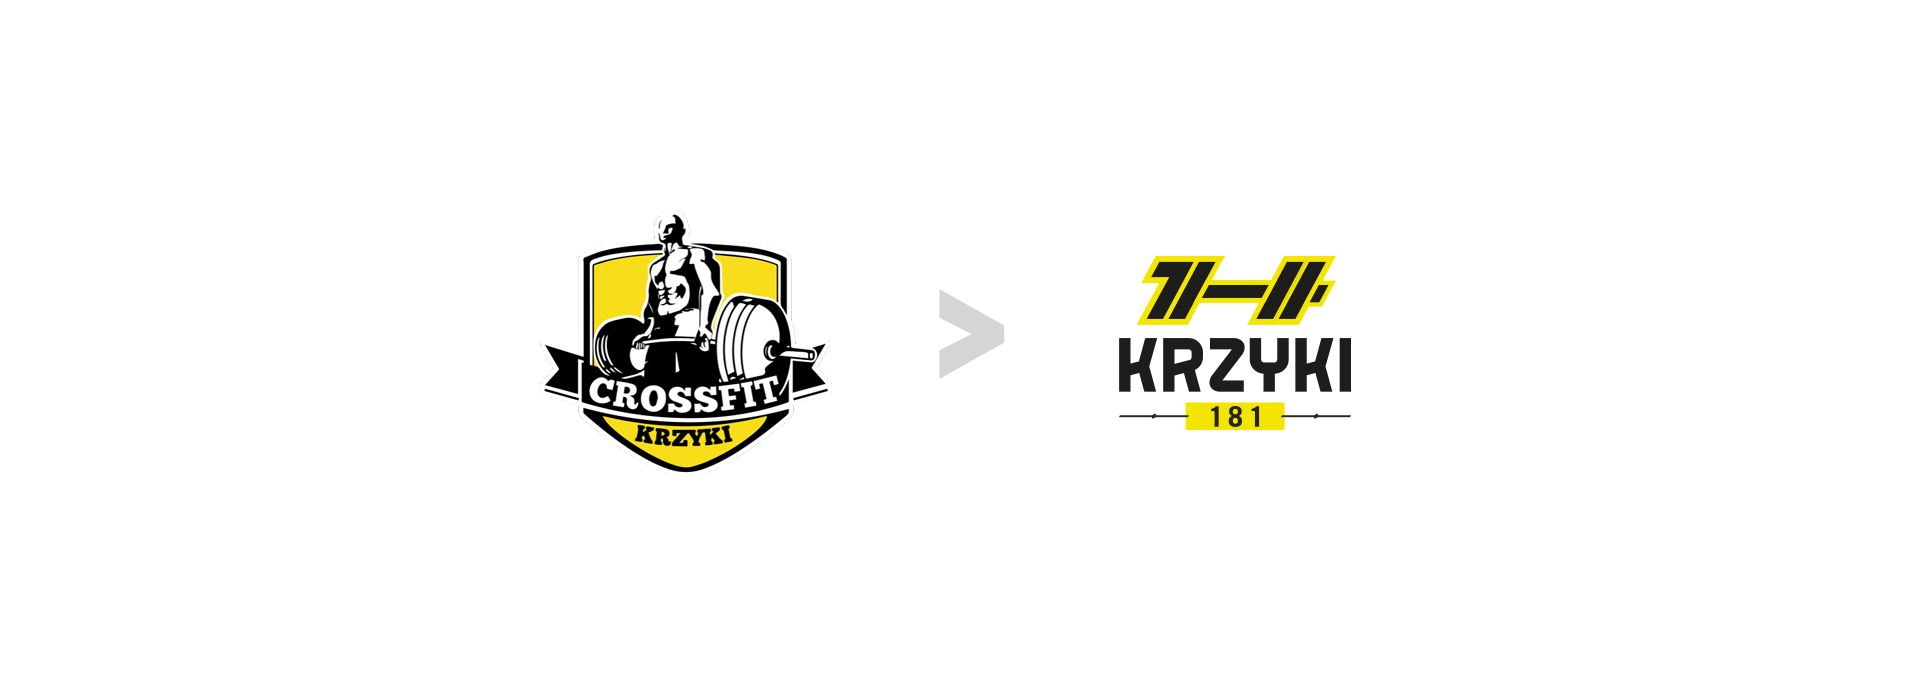 Seven Design - Krzyki 181 - Logo Redesign